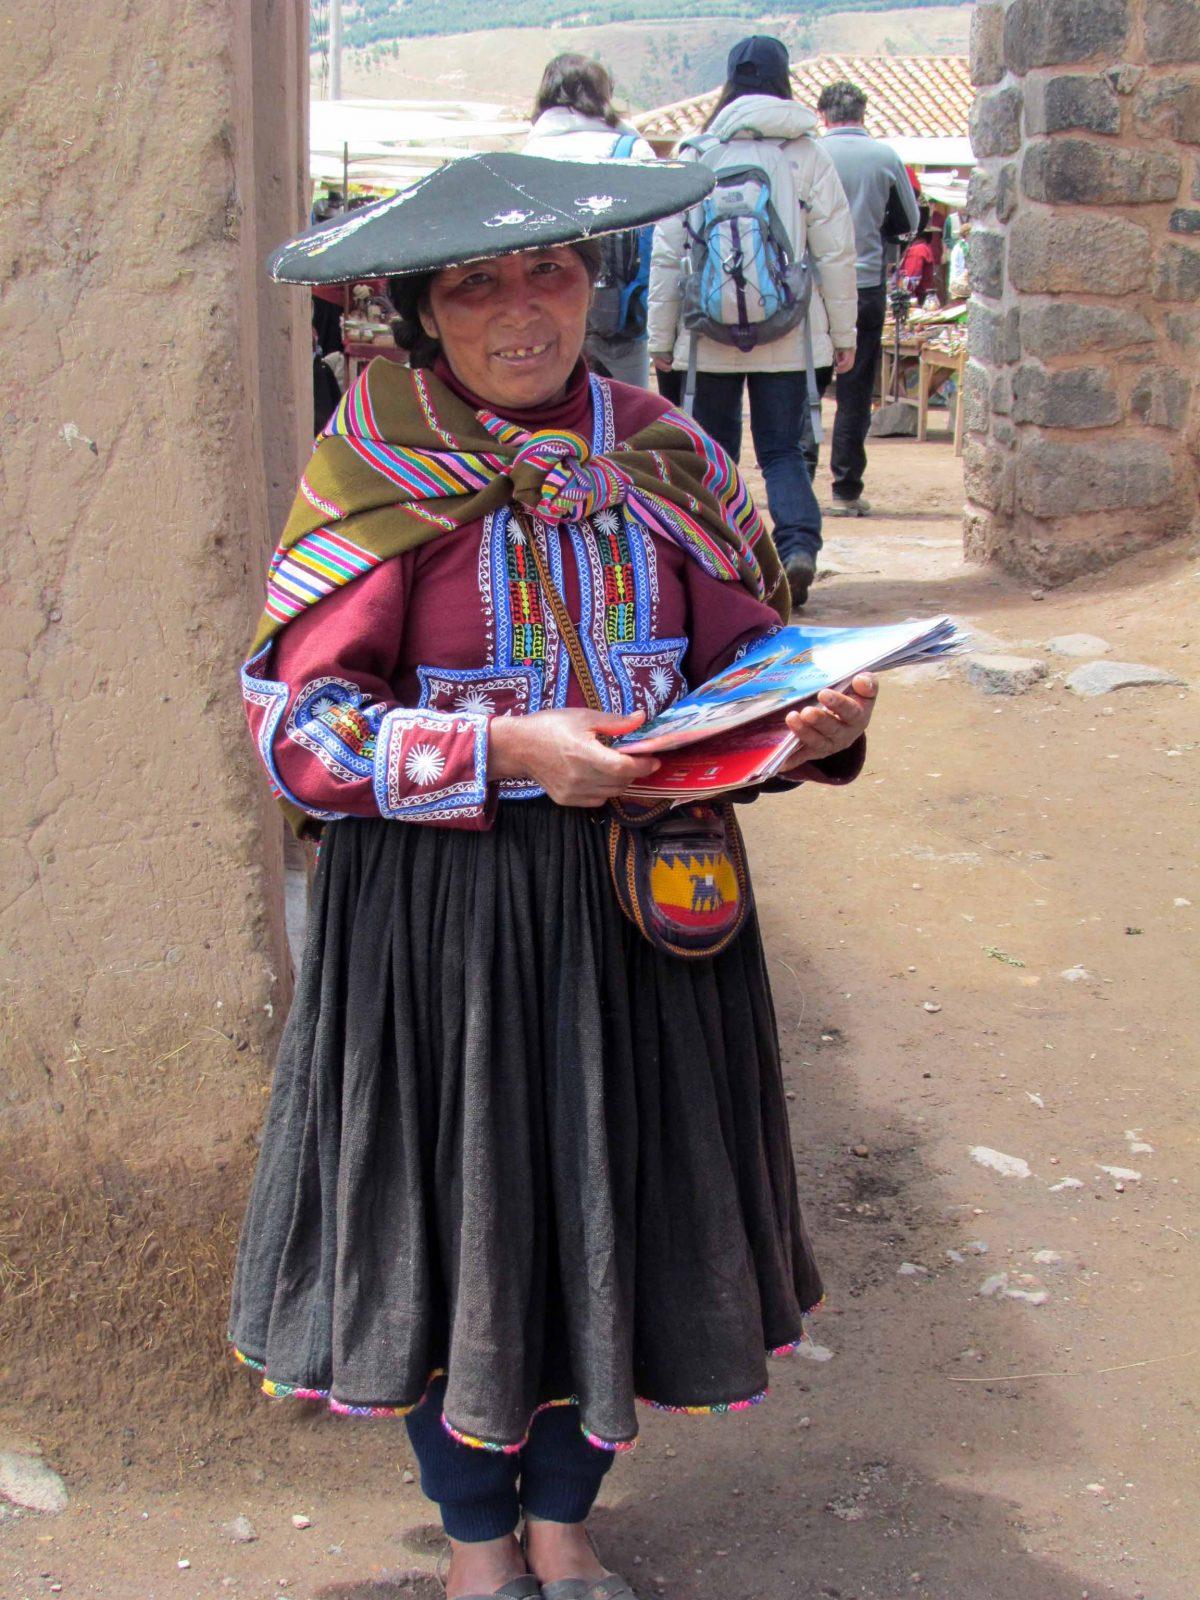 A local woman handing out tourist guides in Raqchi, Peru | ©Angela Drake